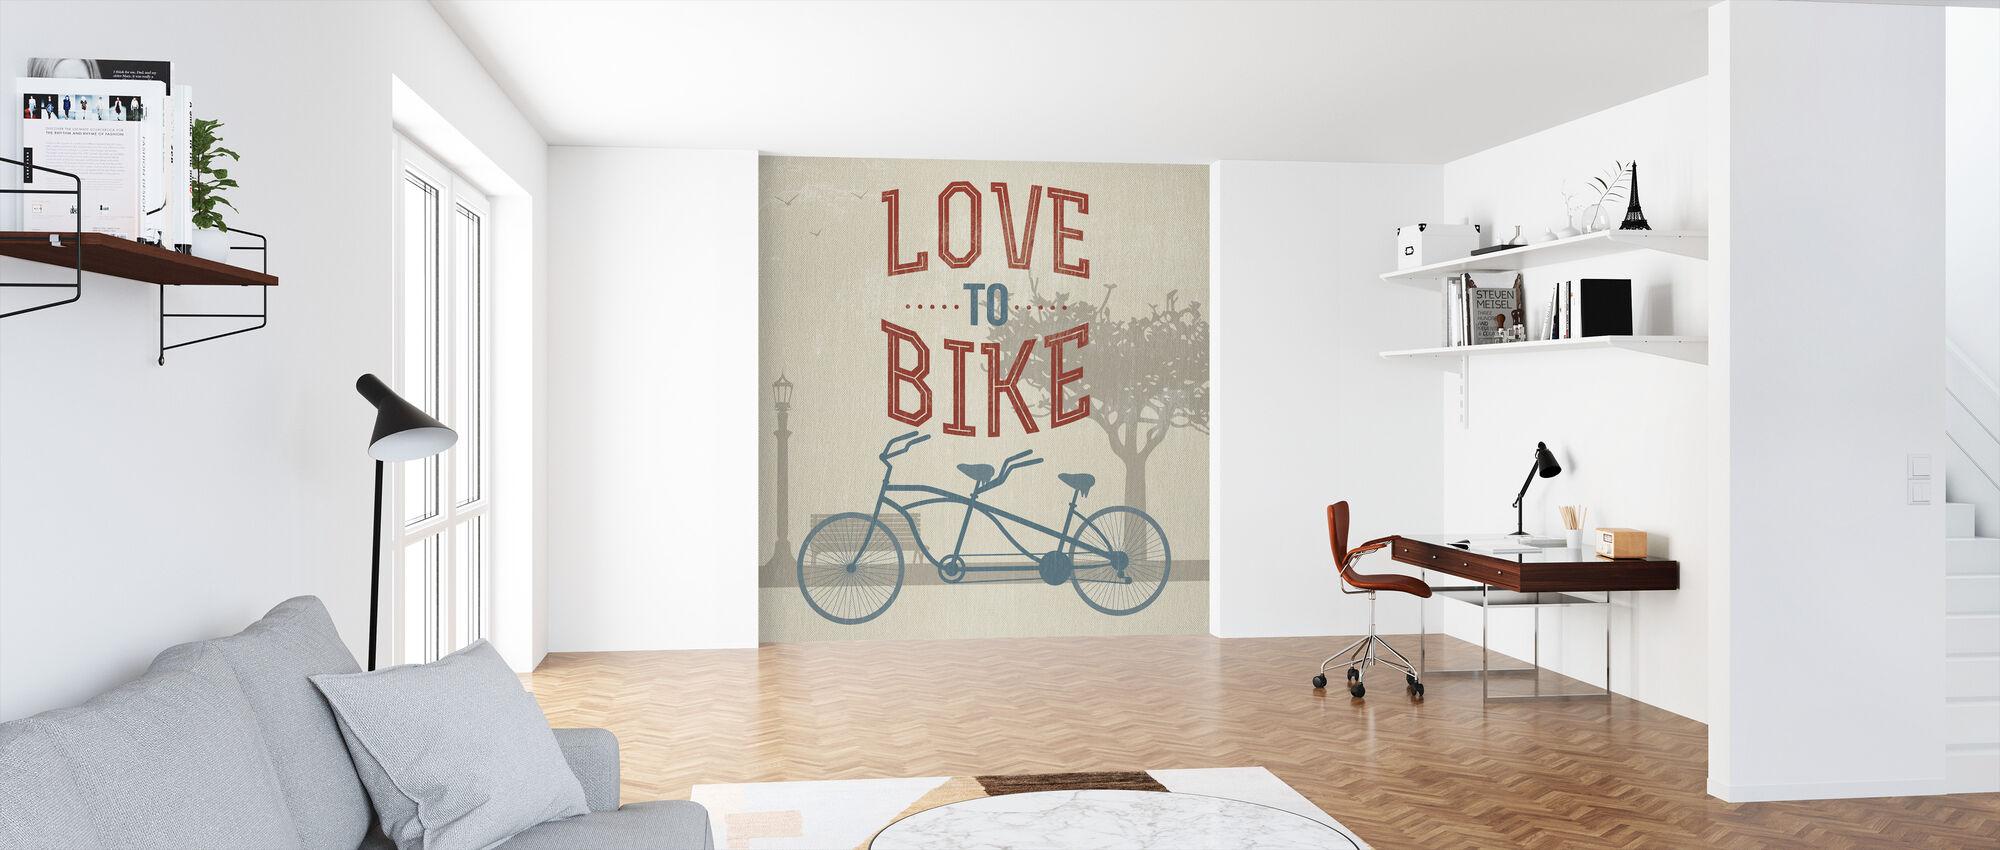 Love to Bike - Papel pintado - Oficina